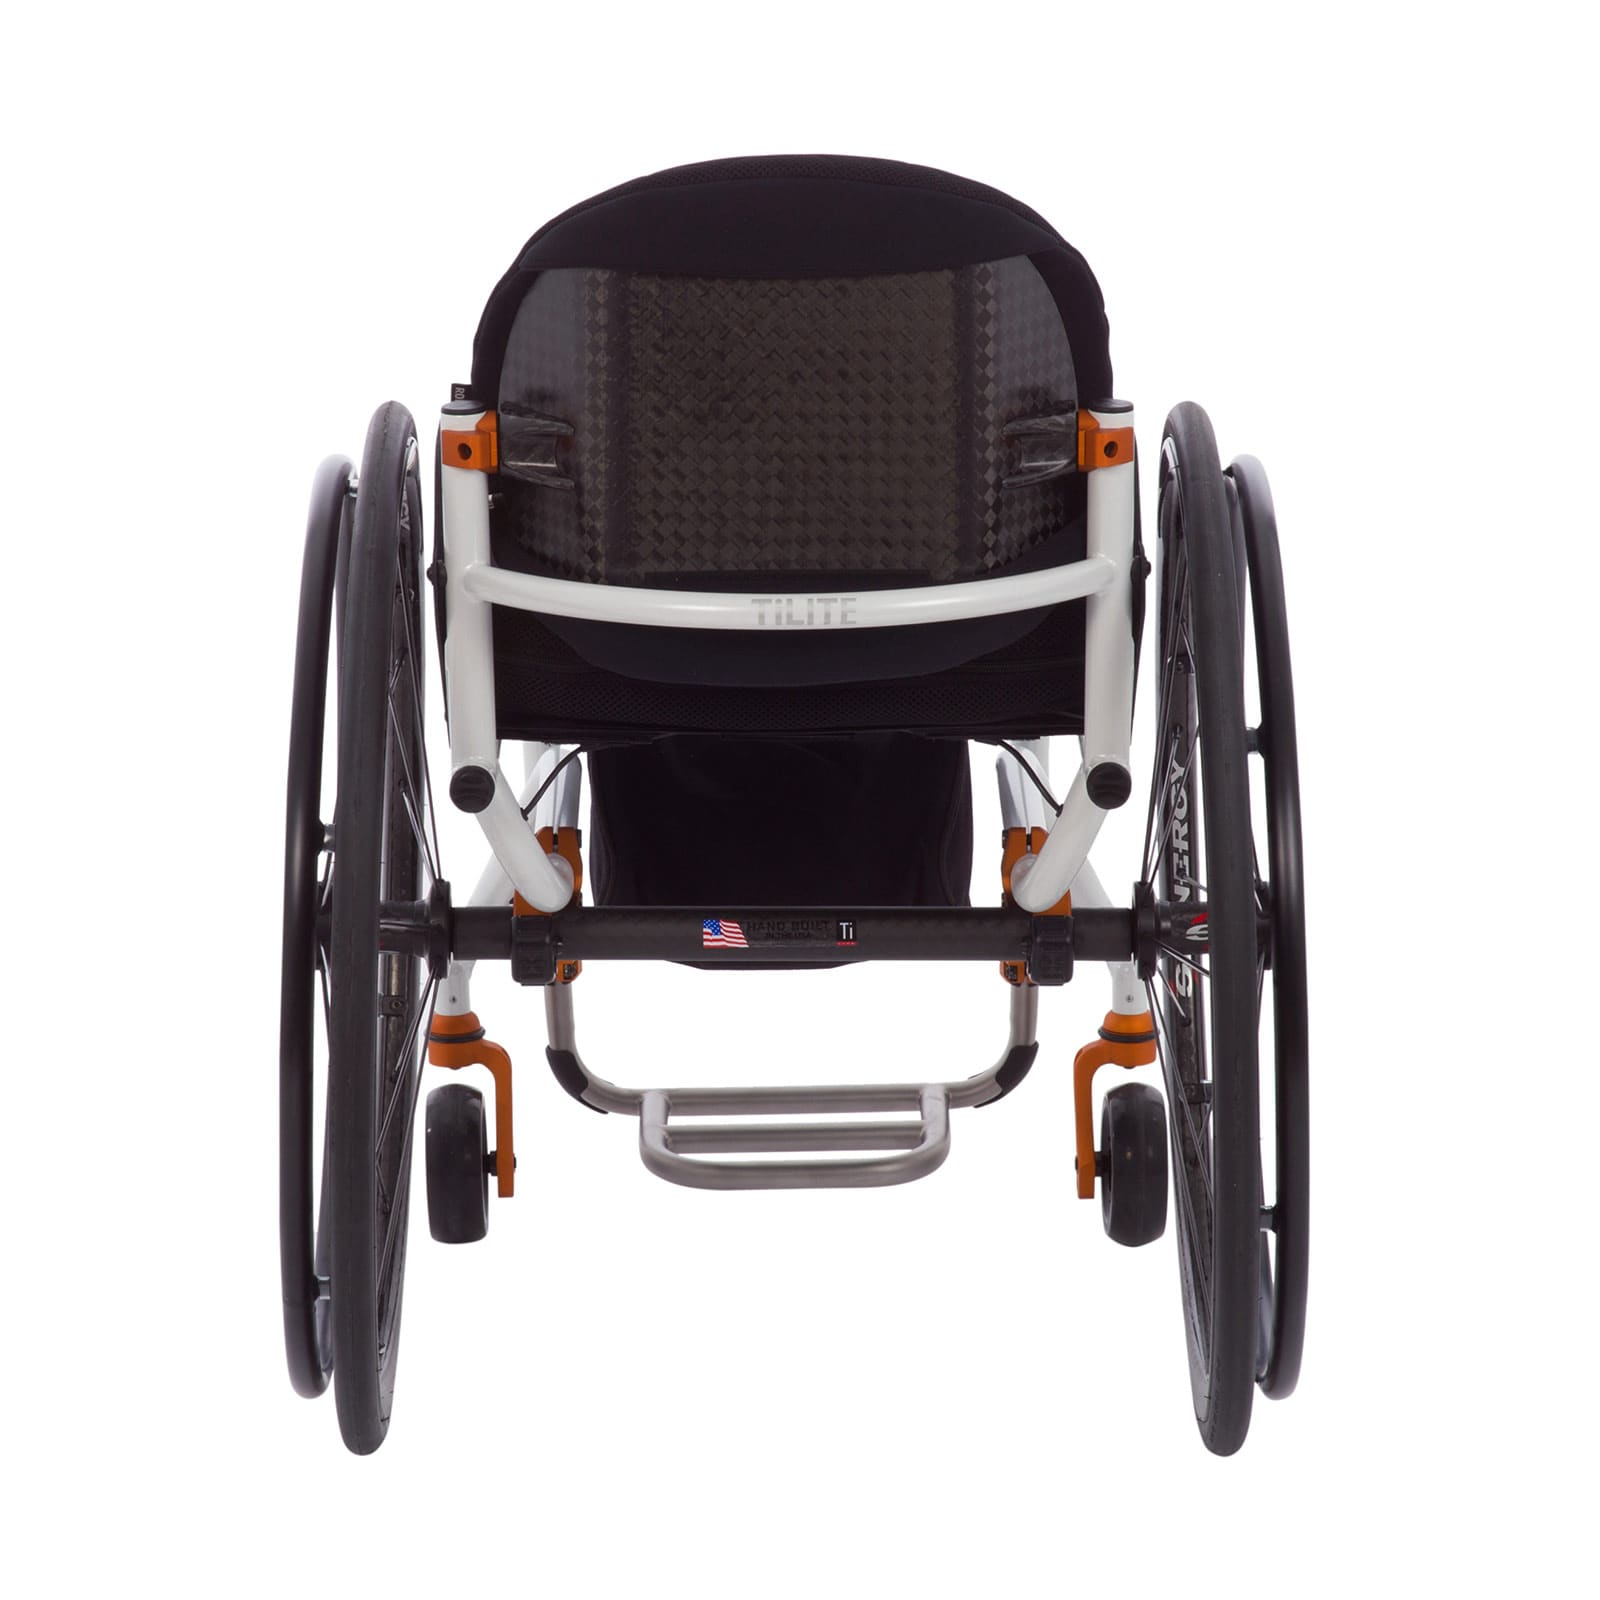 TiLite TR Rigid Titanium Wheelchair FREE SHIPPING How iRoll Sports